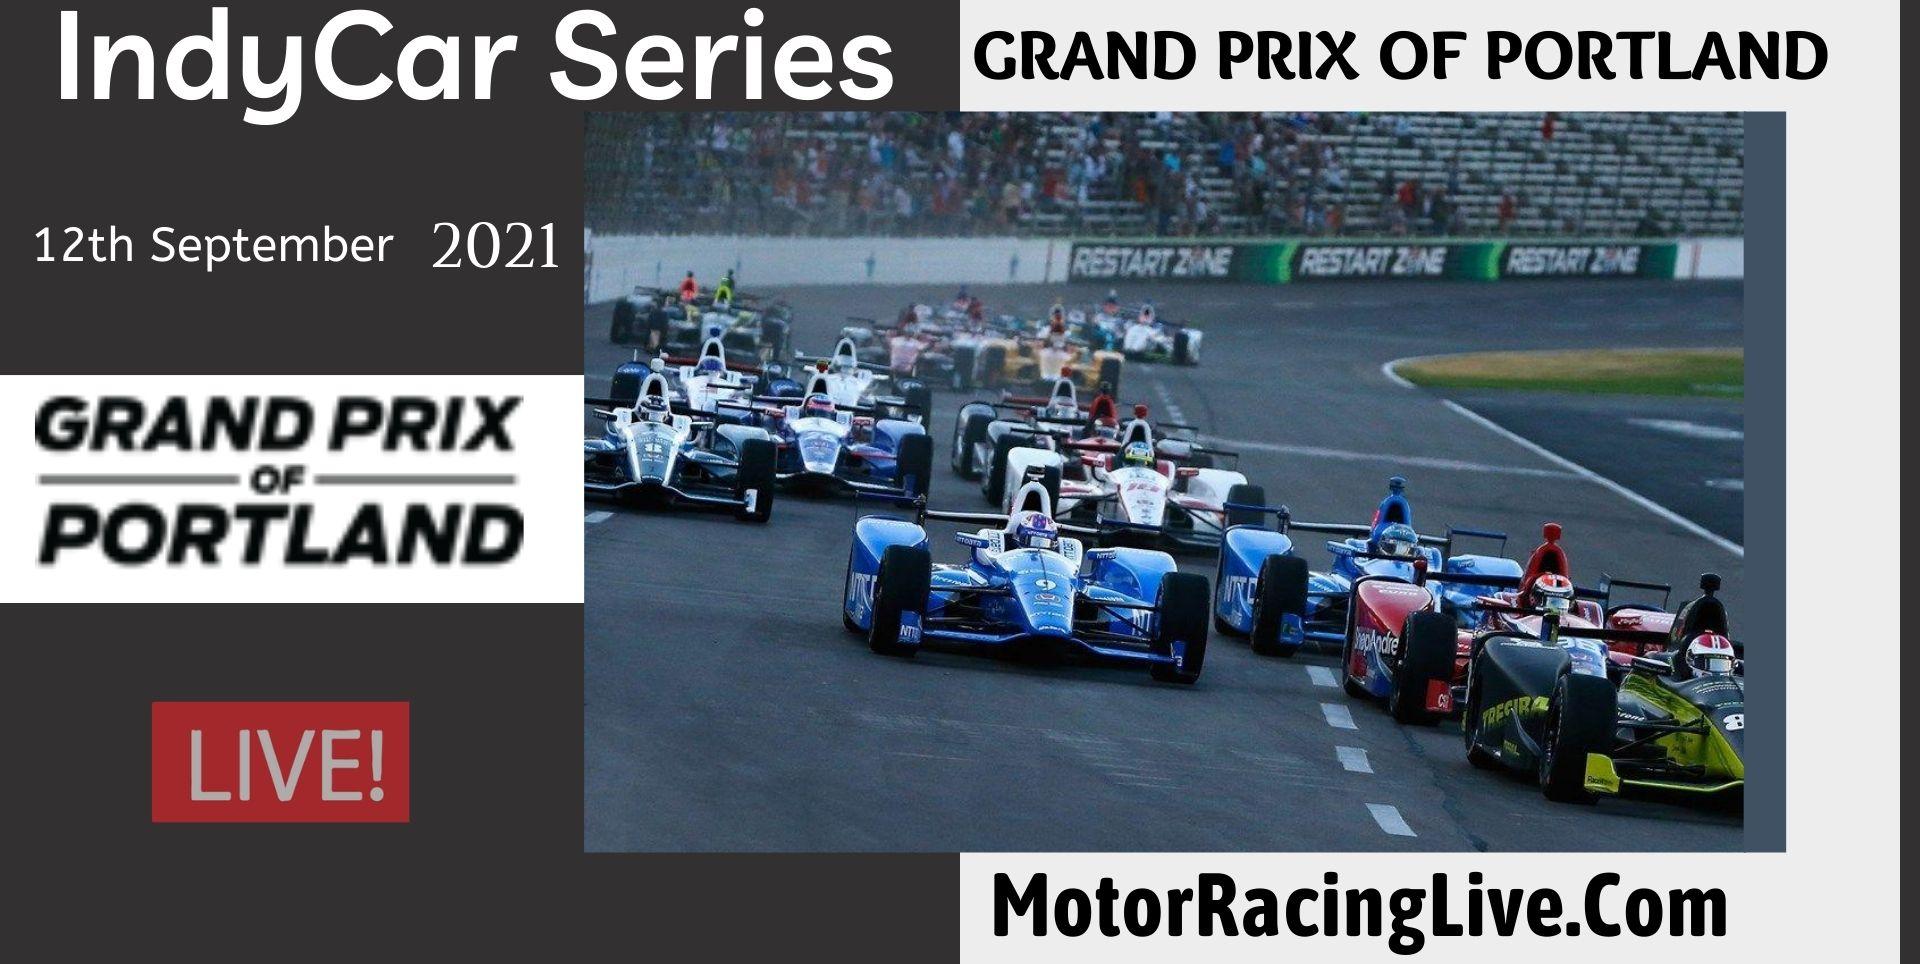 GRAND PRIX OF PORTLAND Live Stream 2021 | Indycar